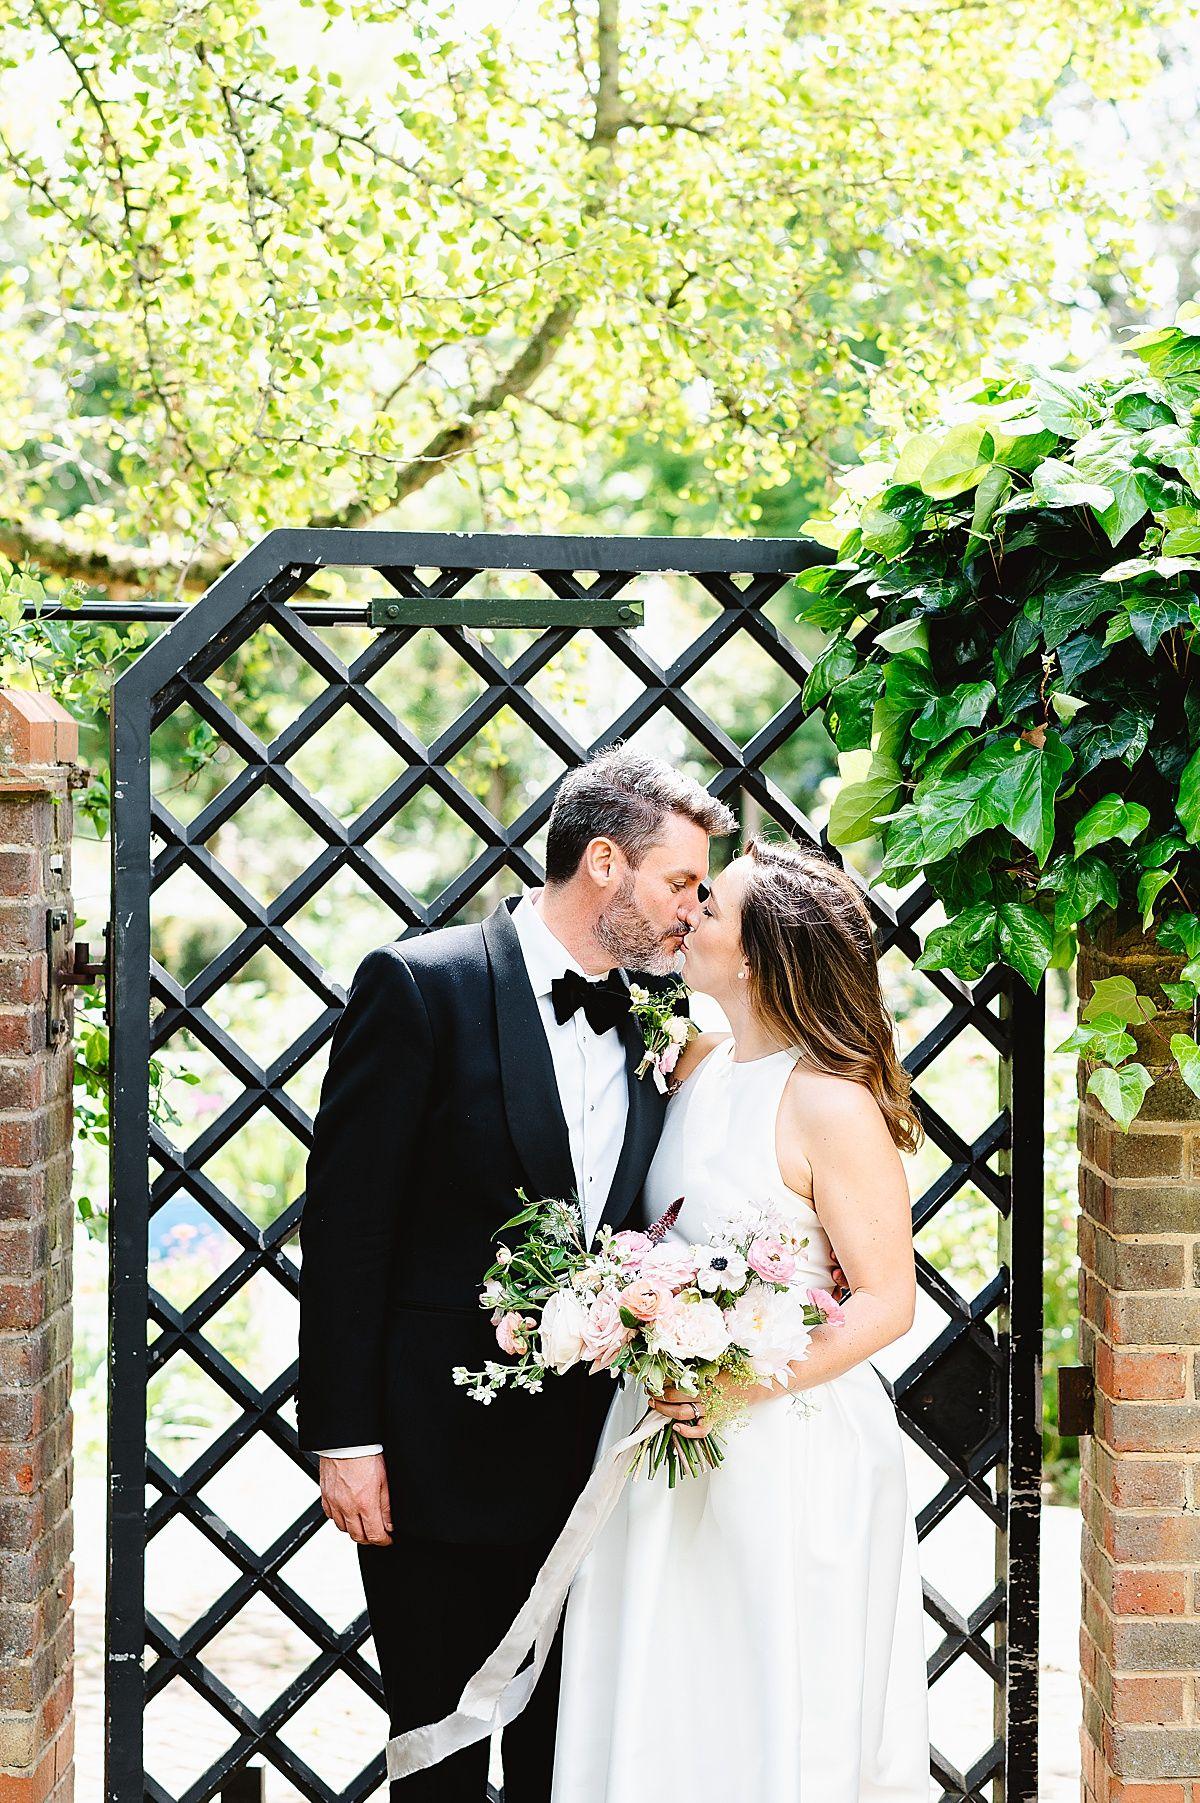 fiona kelly photography fiona kelly photography natural wedding photography 0010